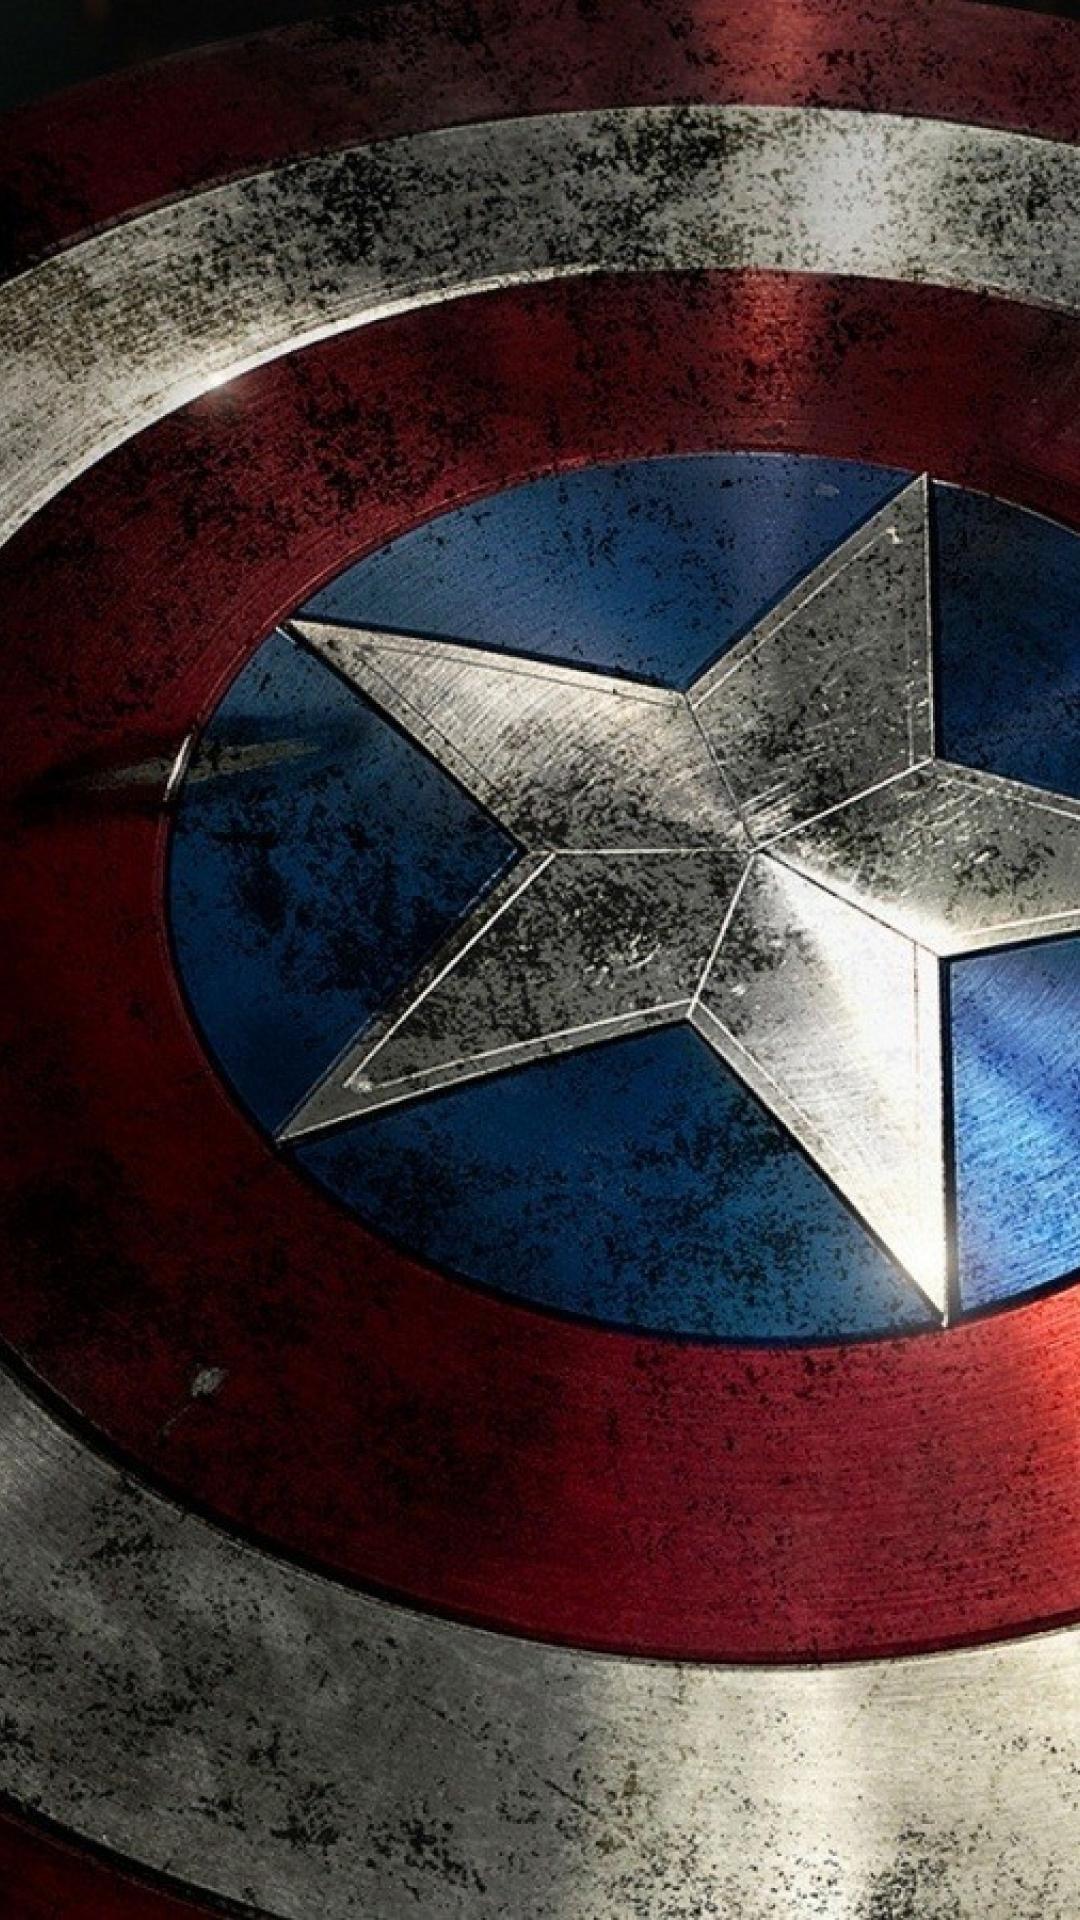 List of Best Marvel Phone Wallpaper HD 2020 by friendbookmark.com